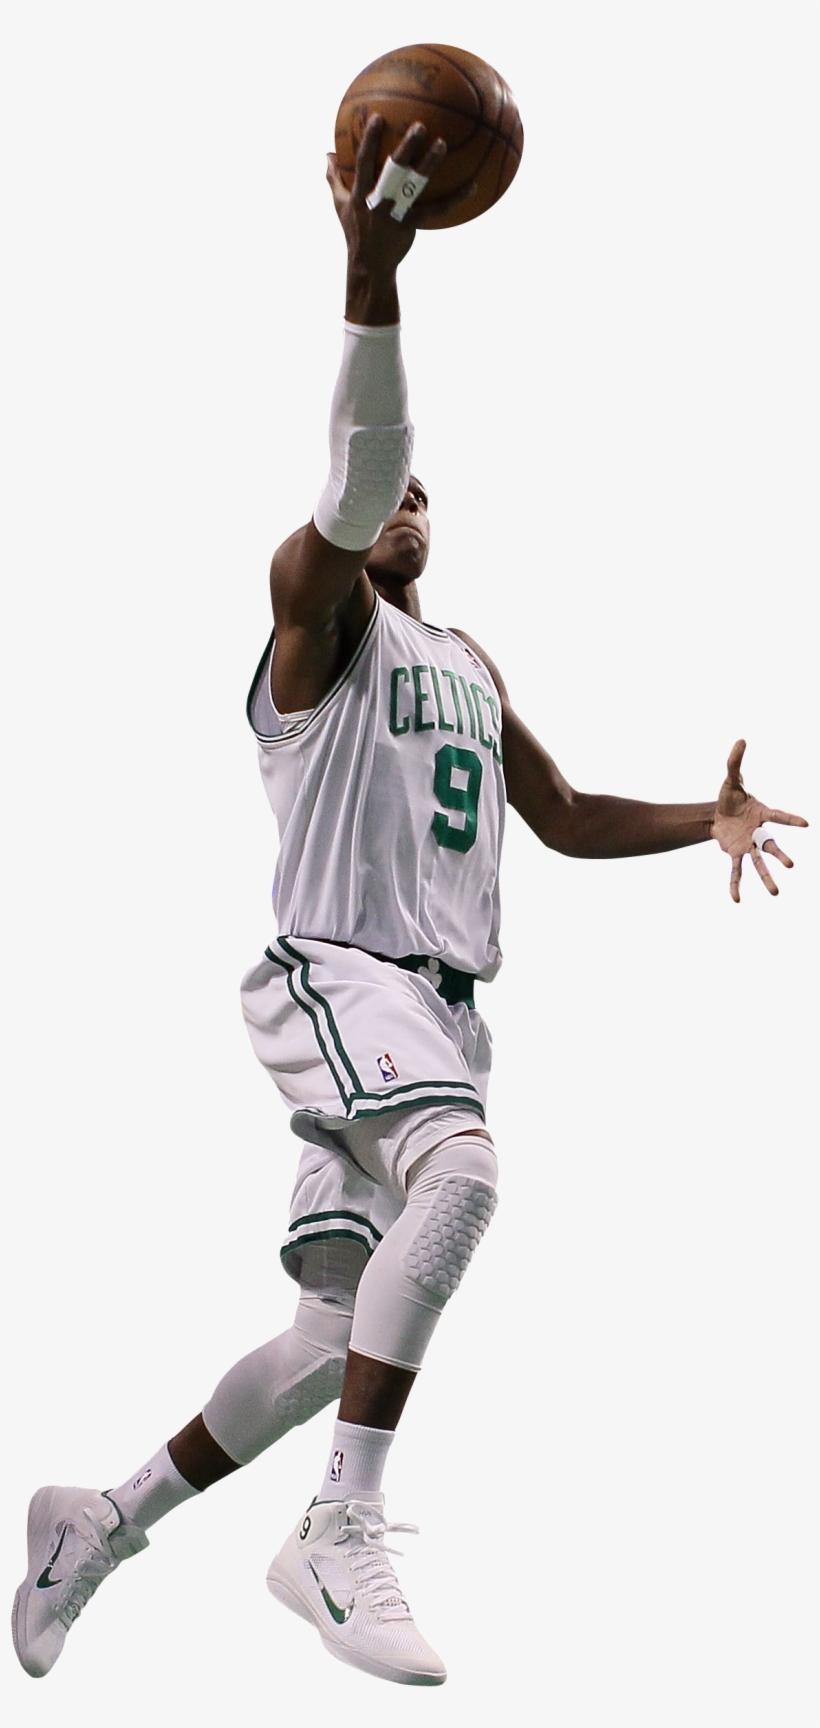 Boston >> Sportz Insomnia Cut Gallery - Basketball Player, transparent png #5881945